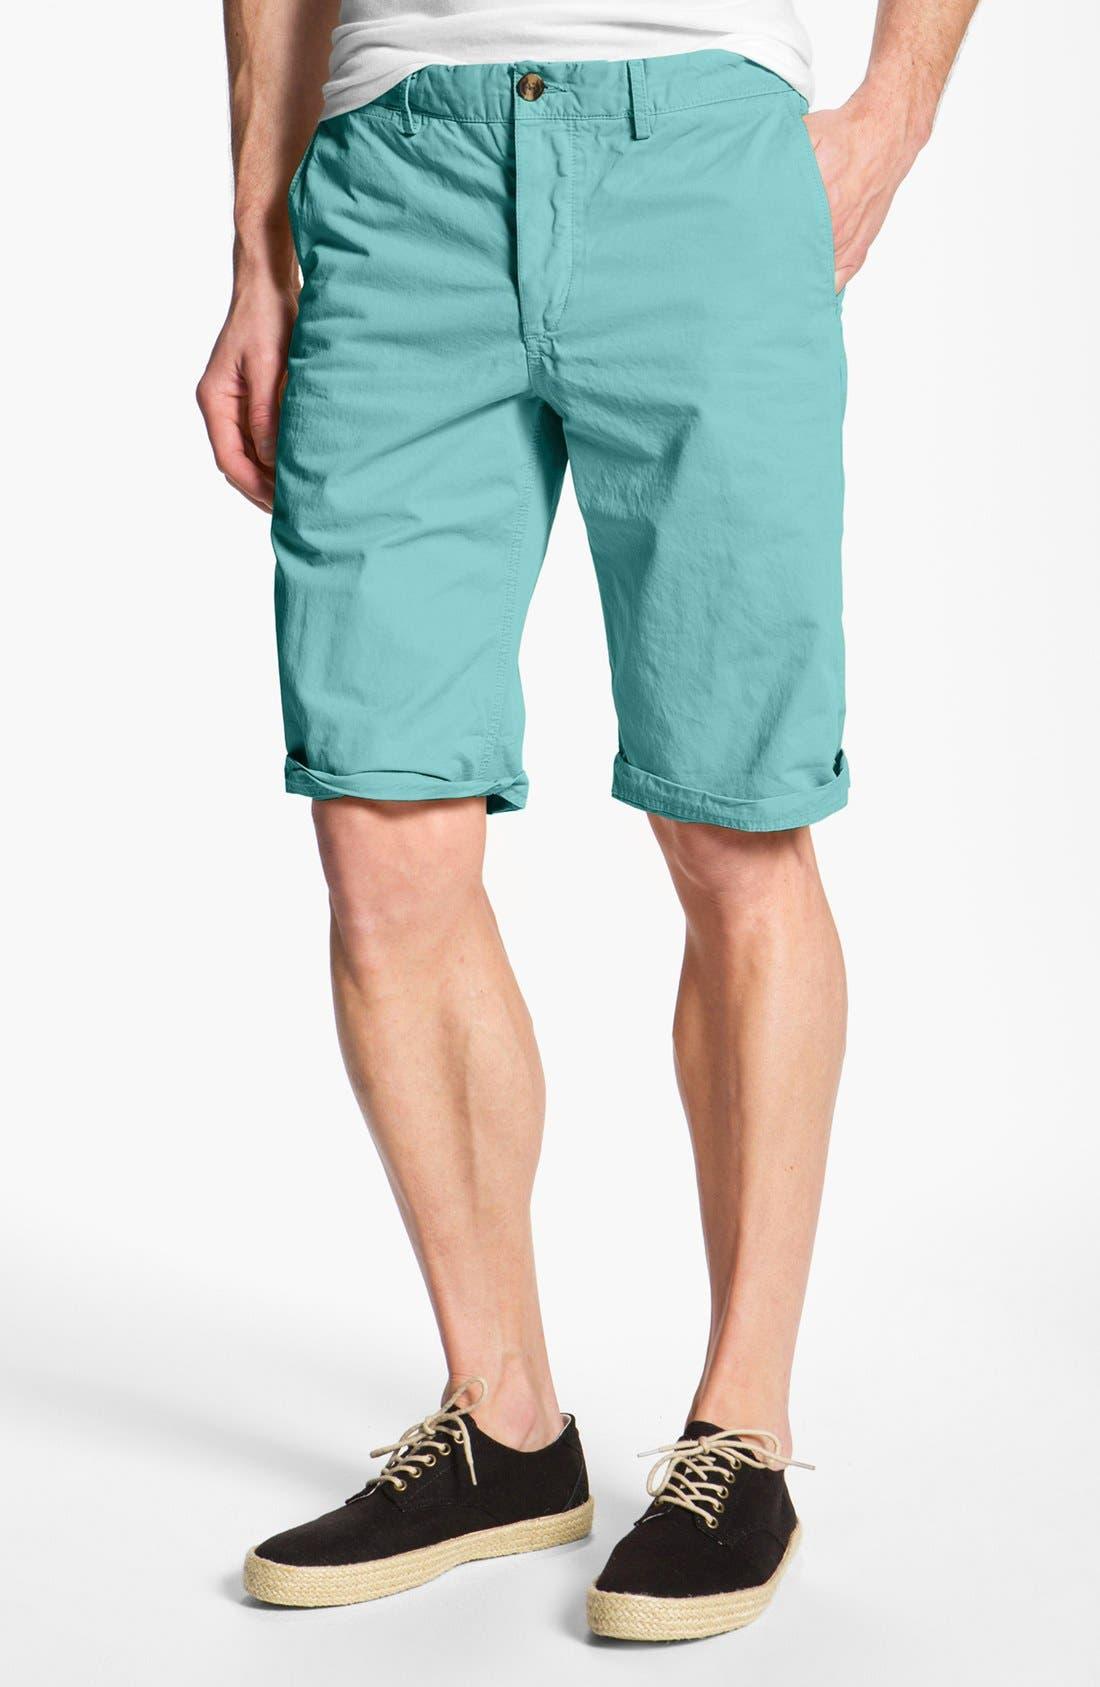 Alternate Image 1 Selected - Ben Sherman Twill Chino Shorts